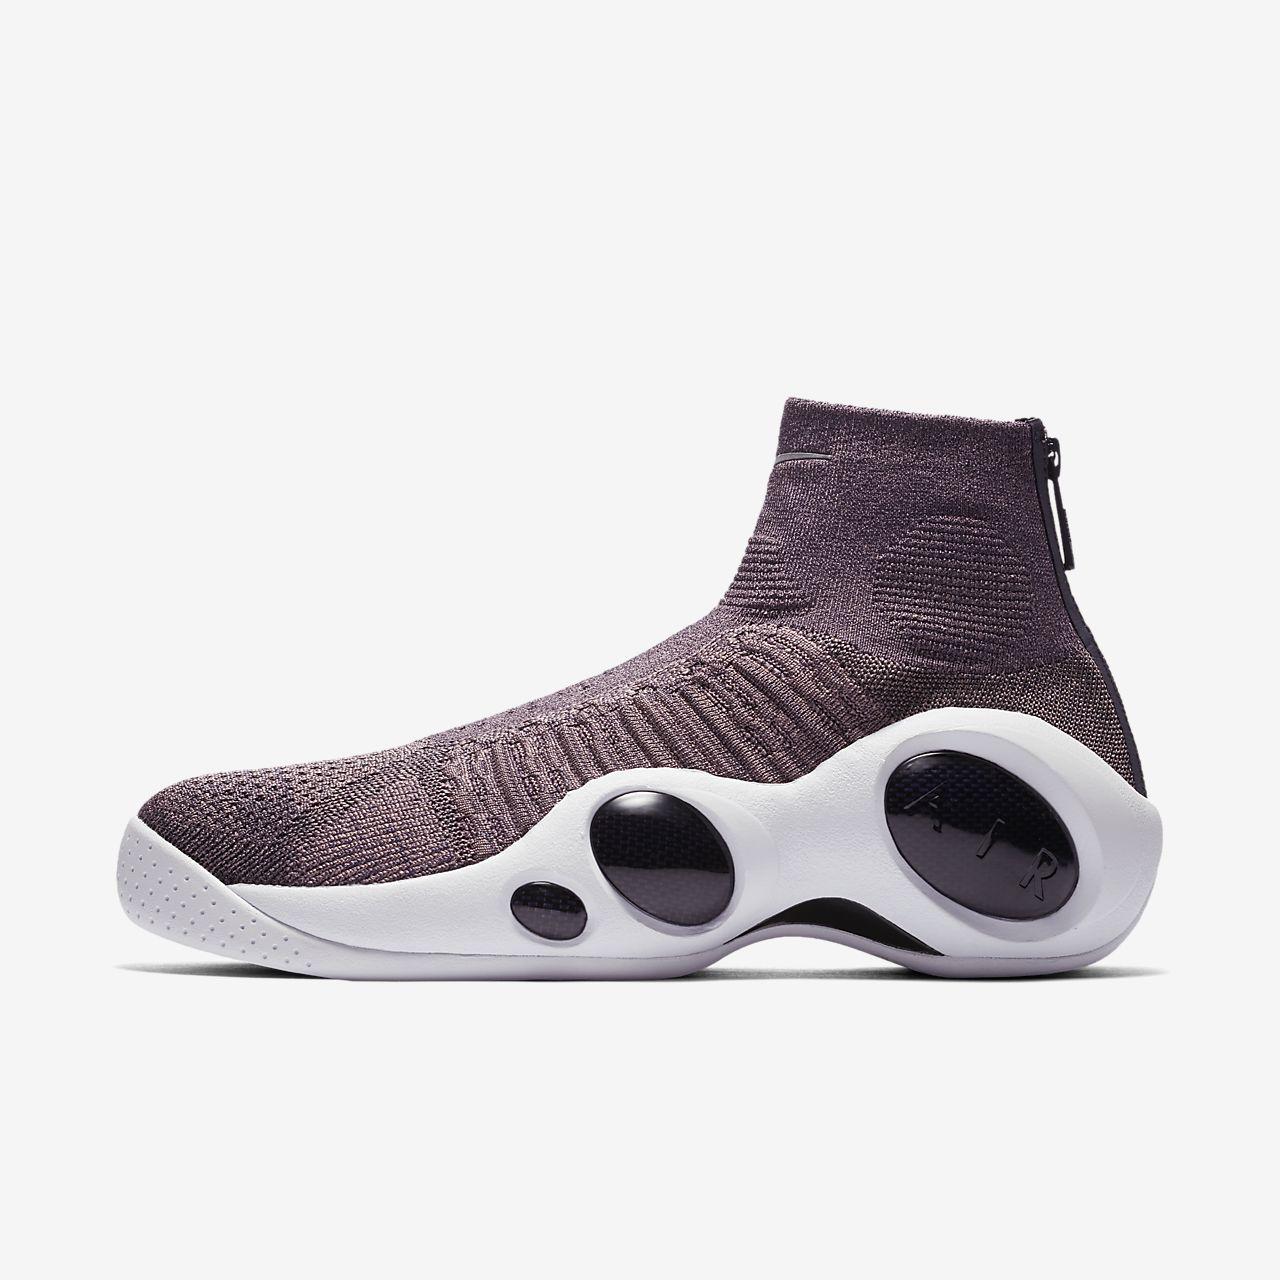 sports shoes 941fd 281bb ... Buty męskie Nike Flight Bonafide